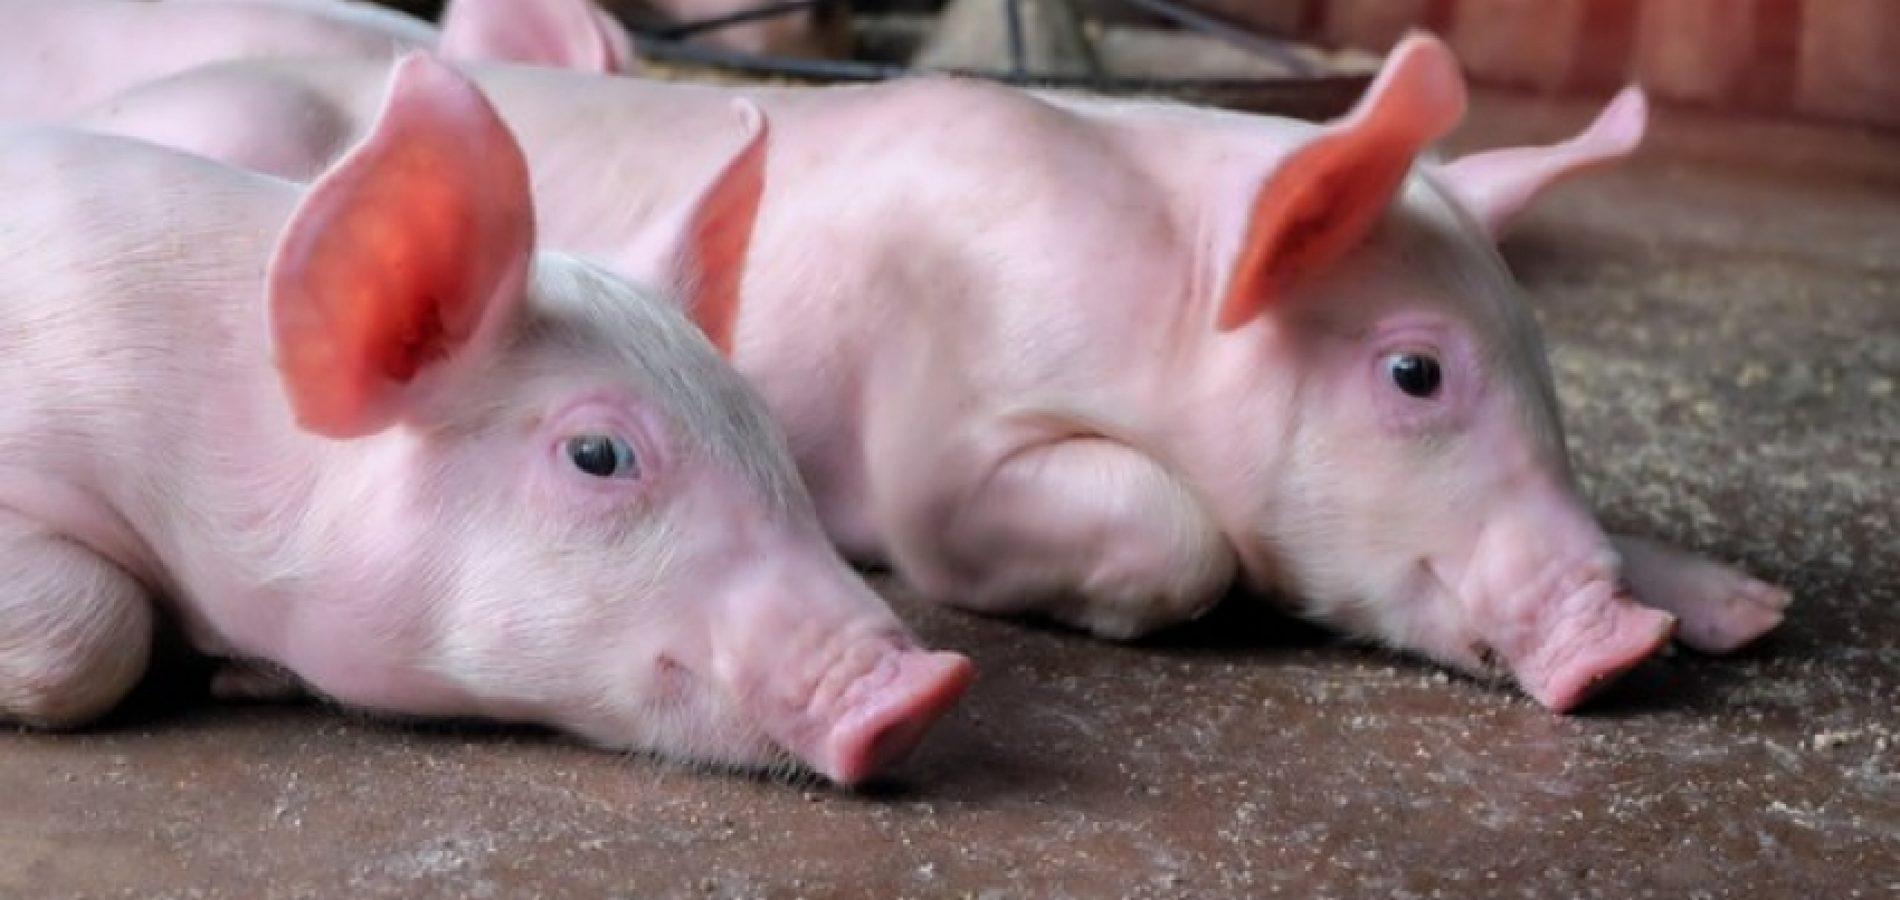 Confirmado segundo foco de peste suína no Piauí; 15 animais sacrificados